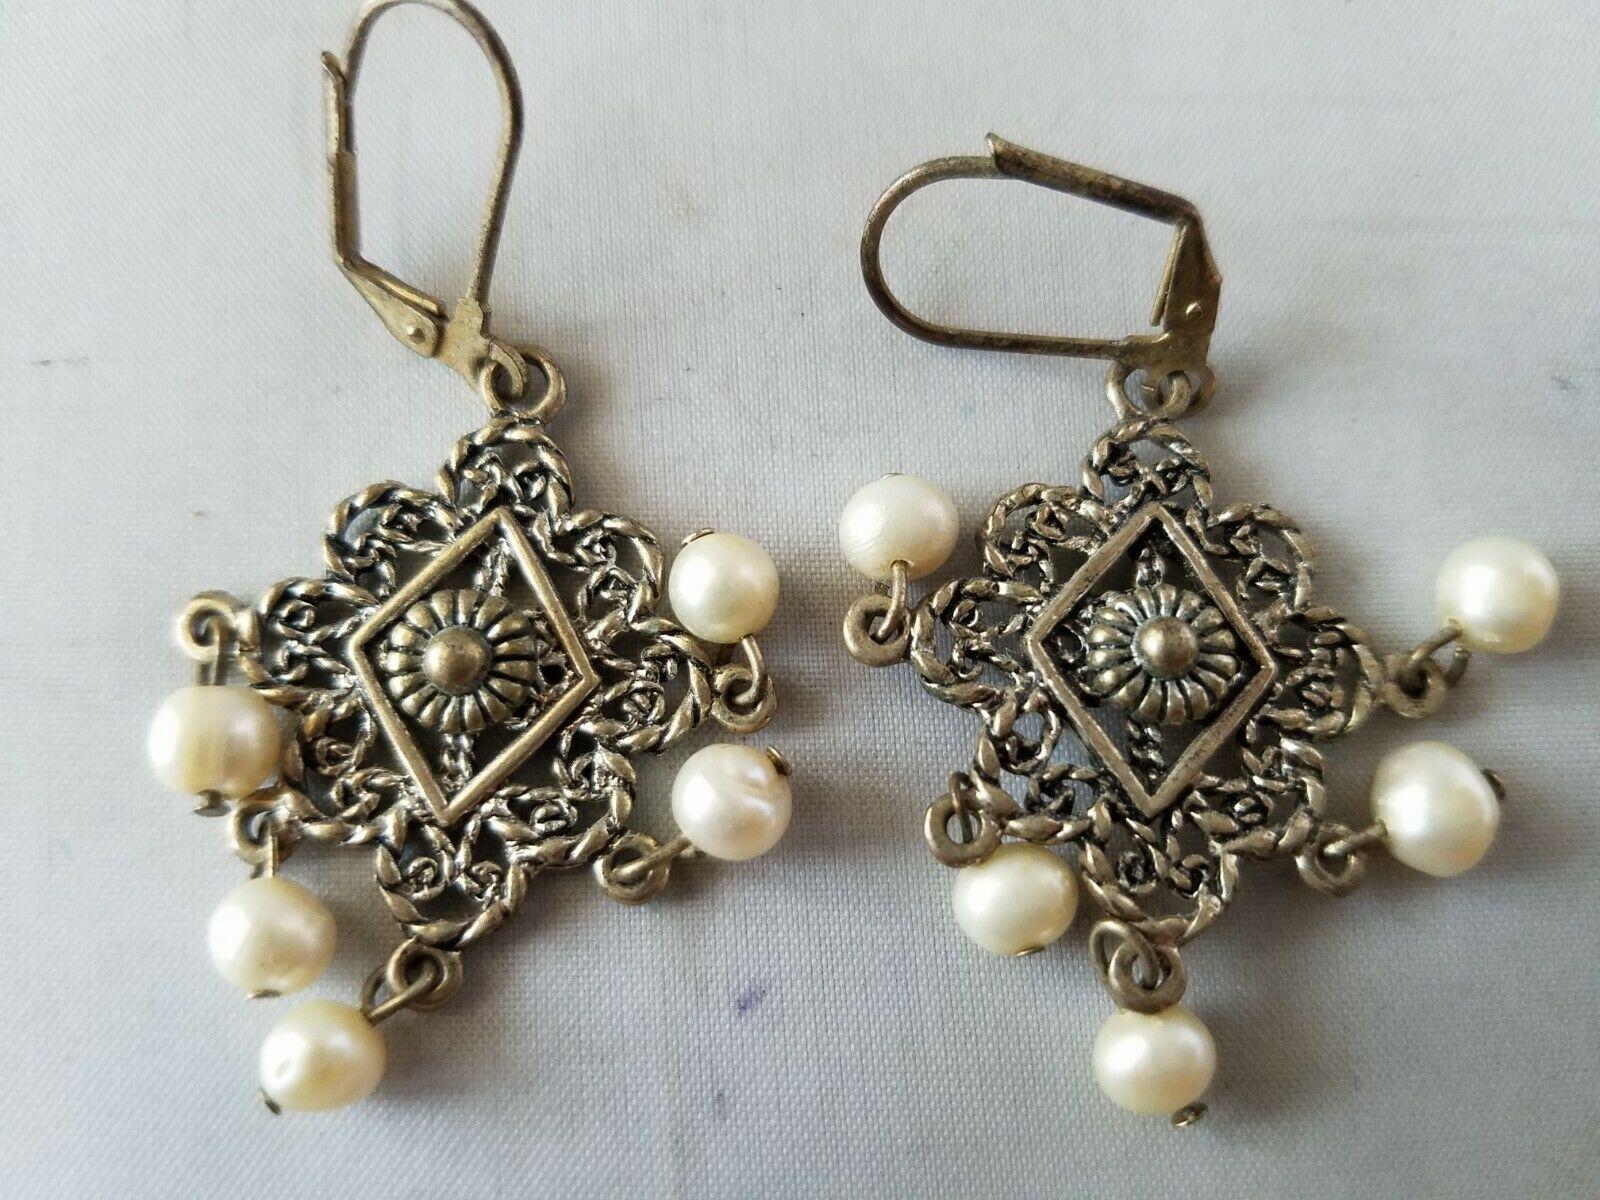 Fashion Vintage Jewelry Set Dangle Brooch Pin & Matching Earrings